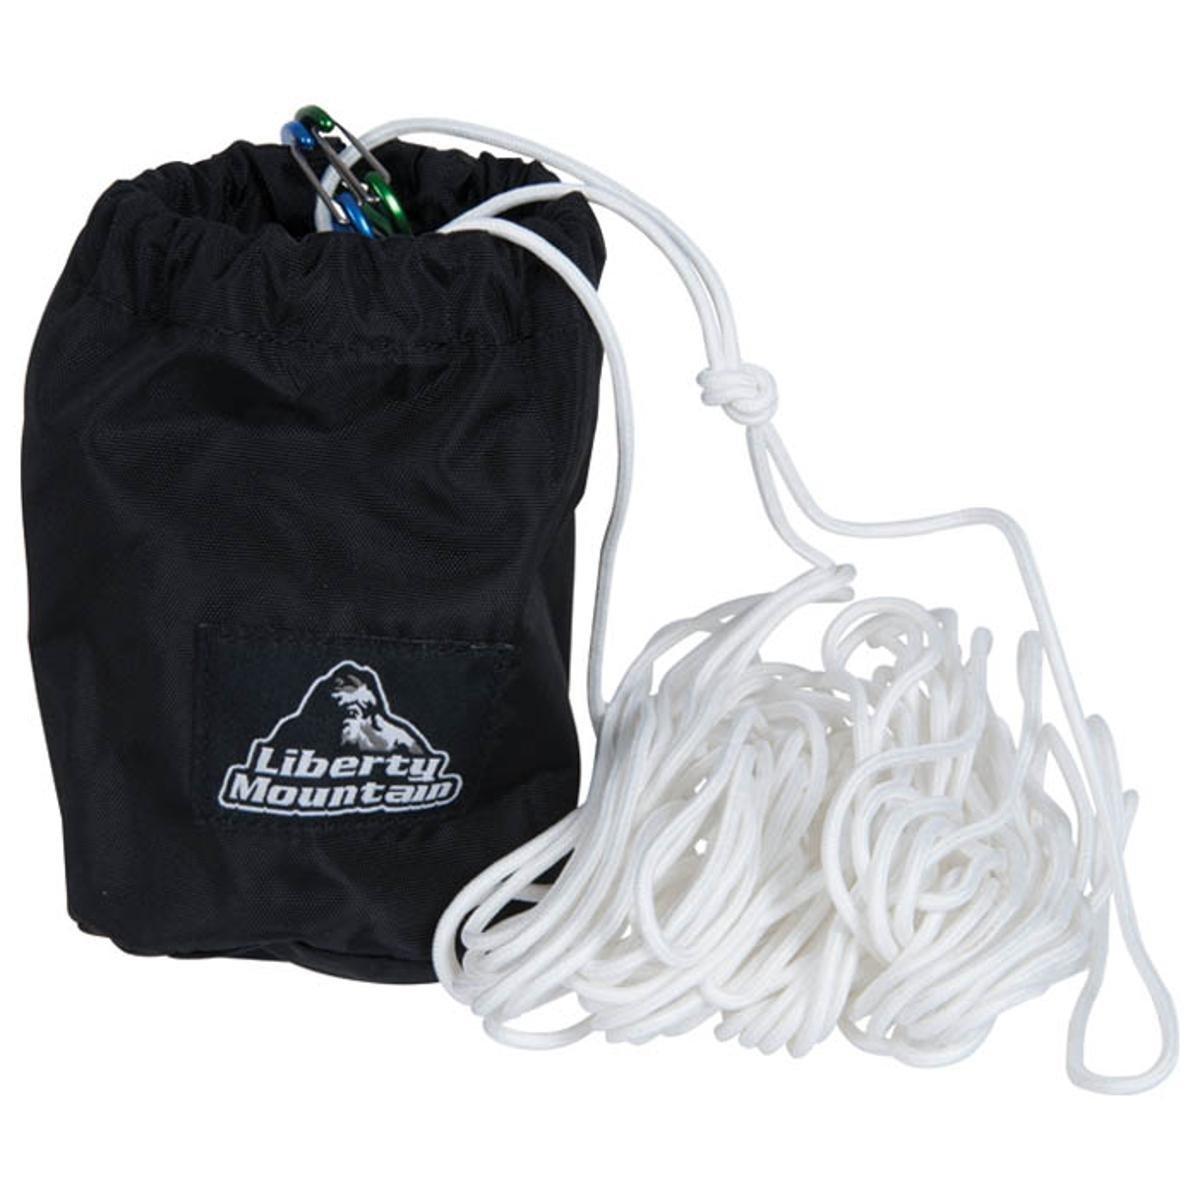 Liberty Mountain 371486 Einfach Hang B-r Bag Kit Animal Sicherheit